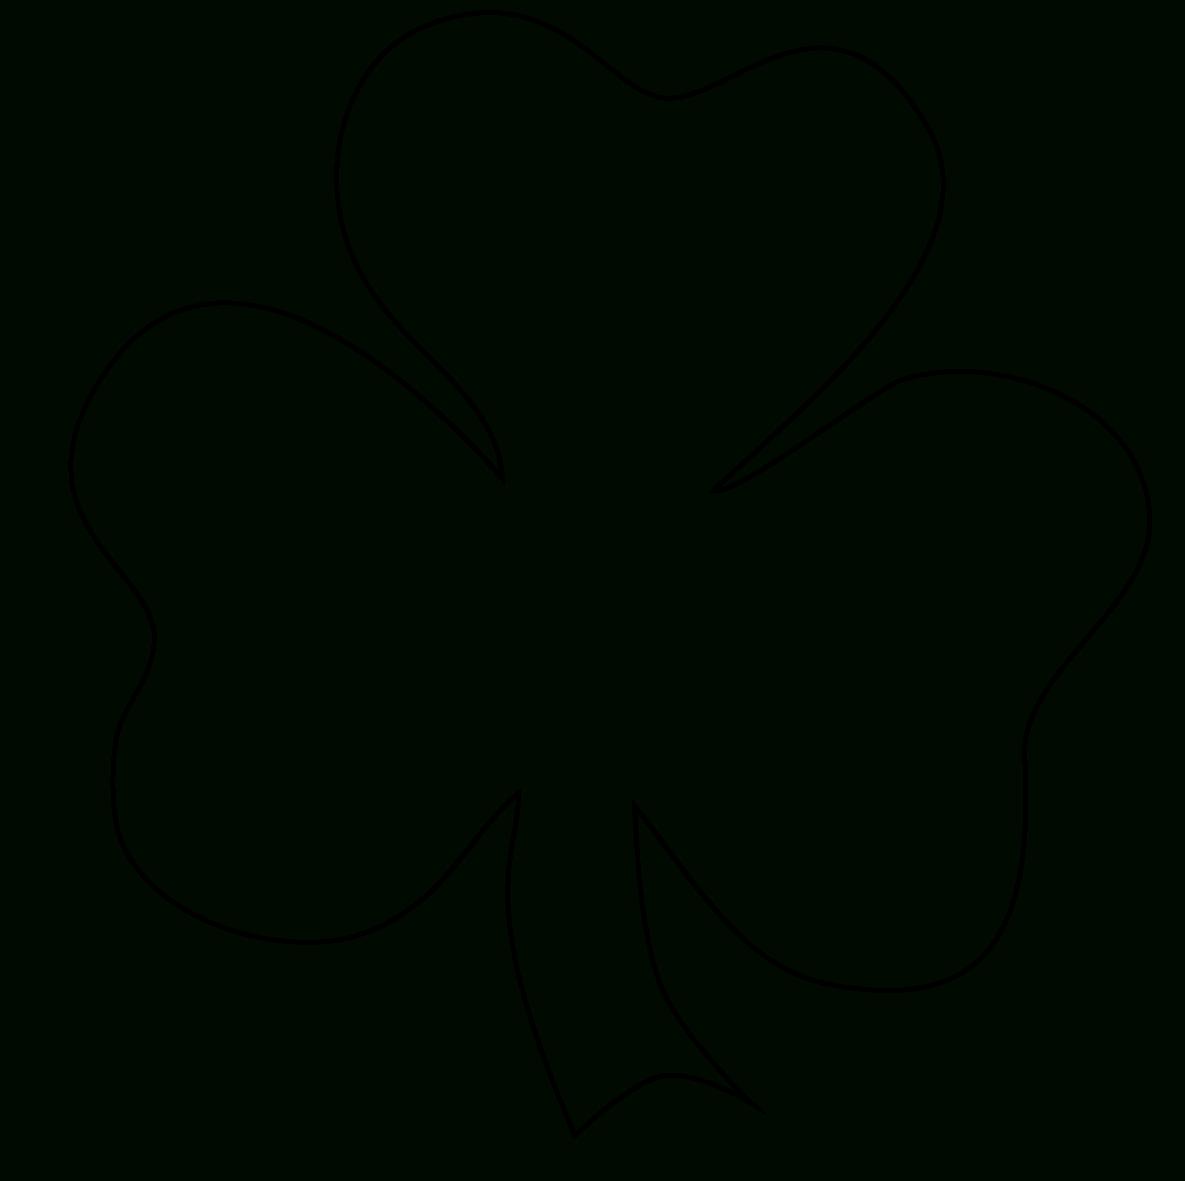 Free Four Leaf Clover Outline, Download Free Clip Art, Free Clip Art - Shamrock Template Free Printable